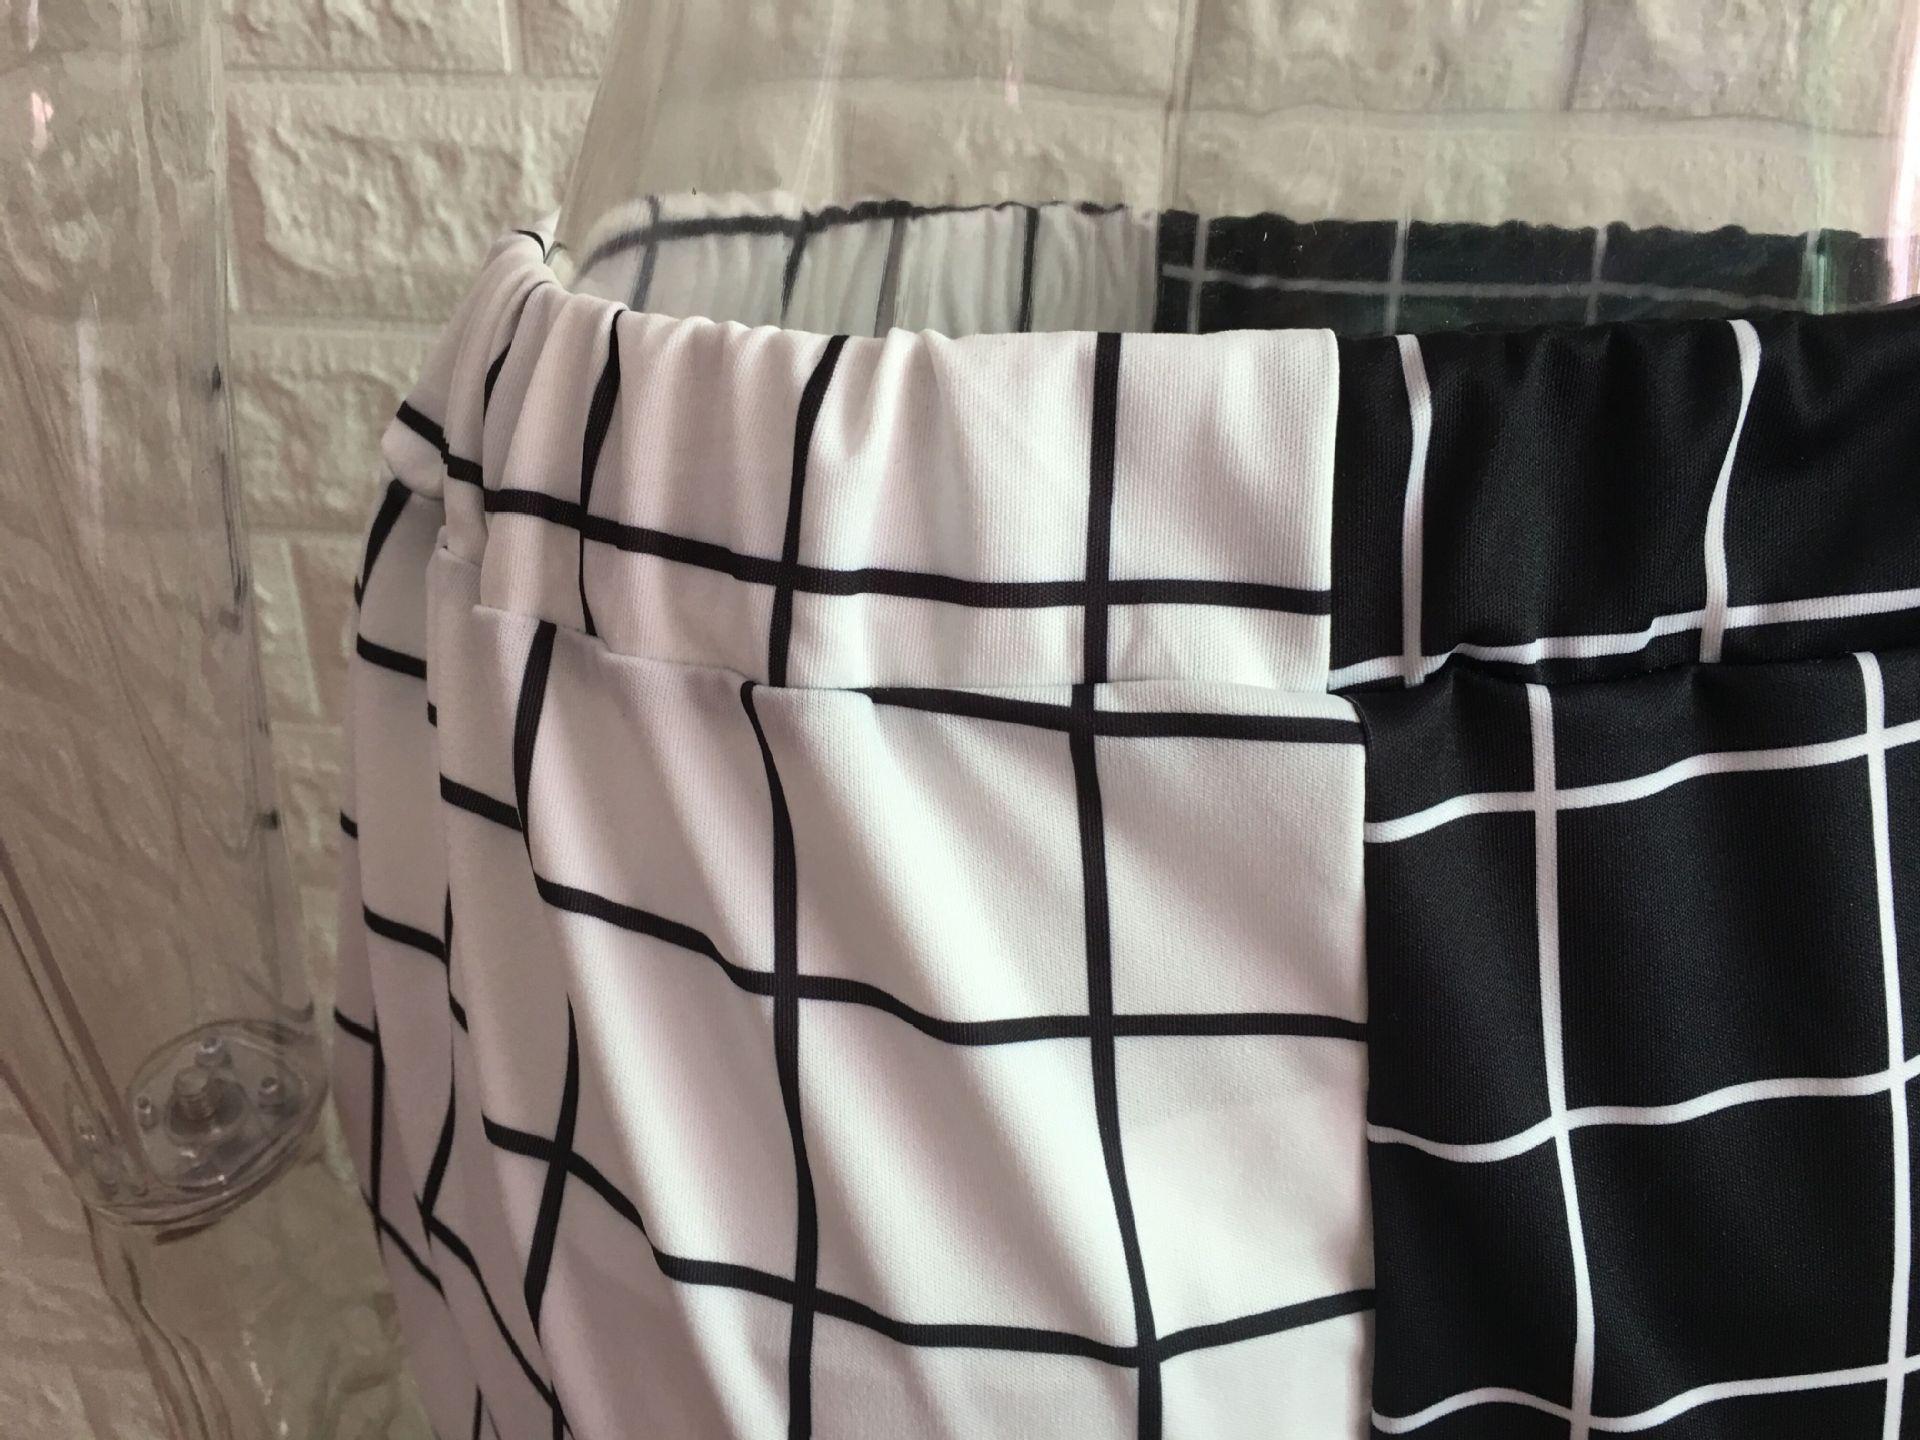 Black and White Checkerboard Trousers Punk E-girl 47